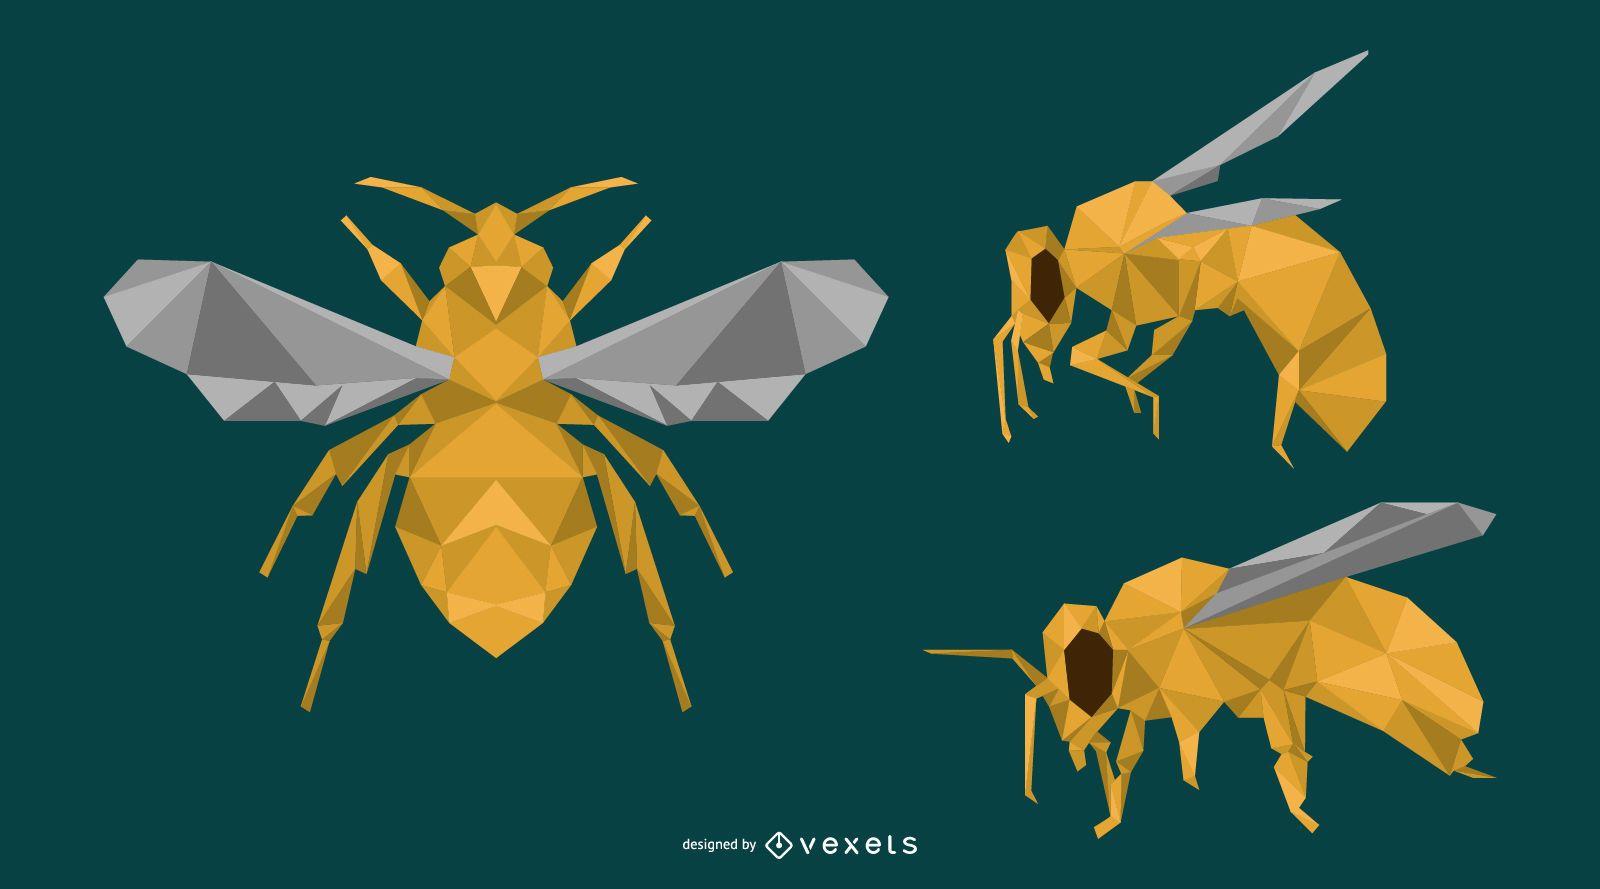 Dise?o de abeja poligonal